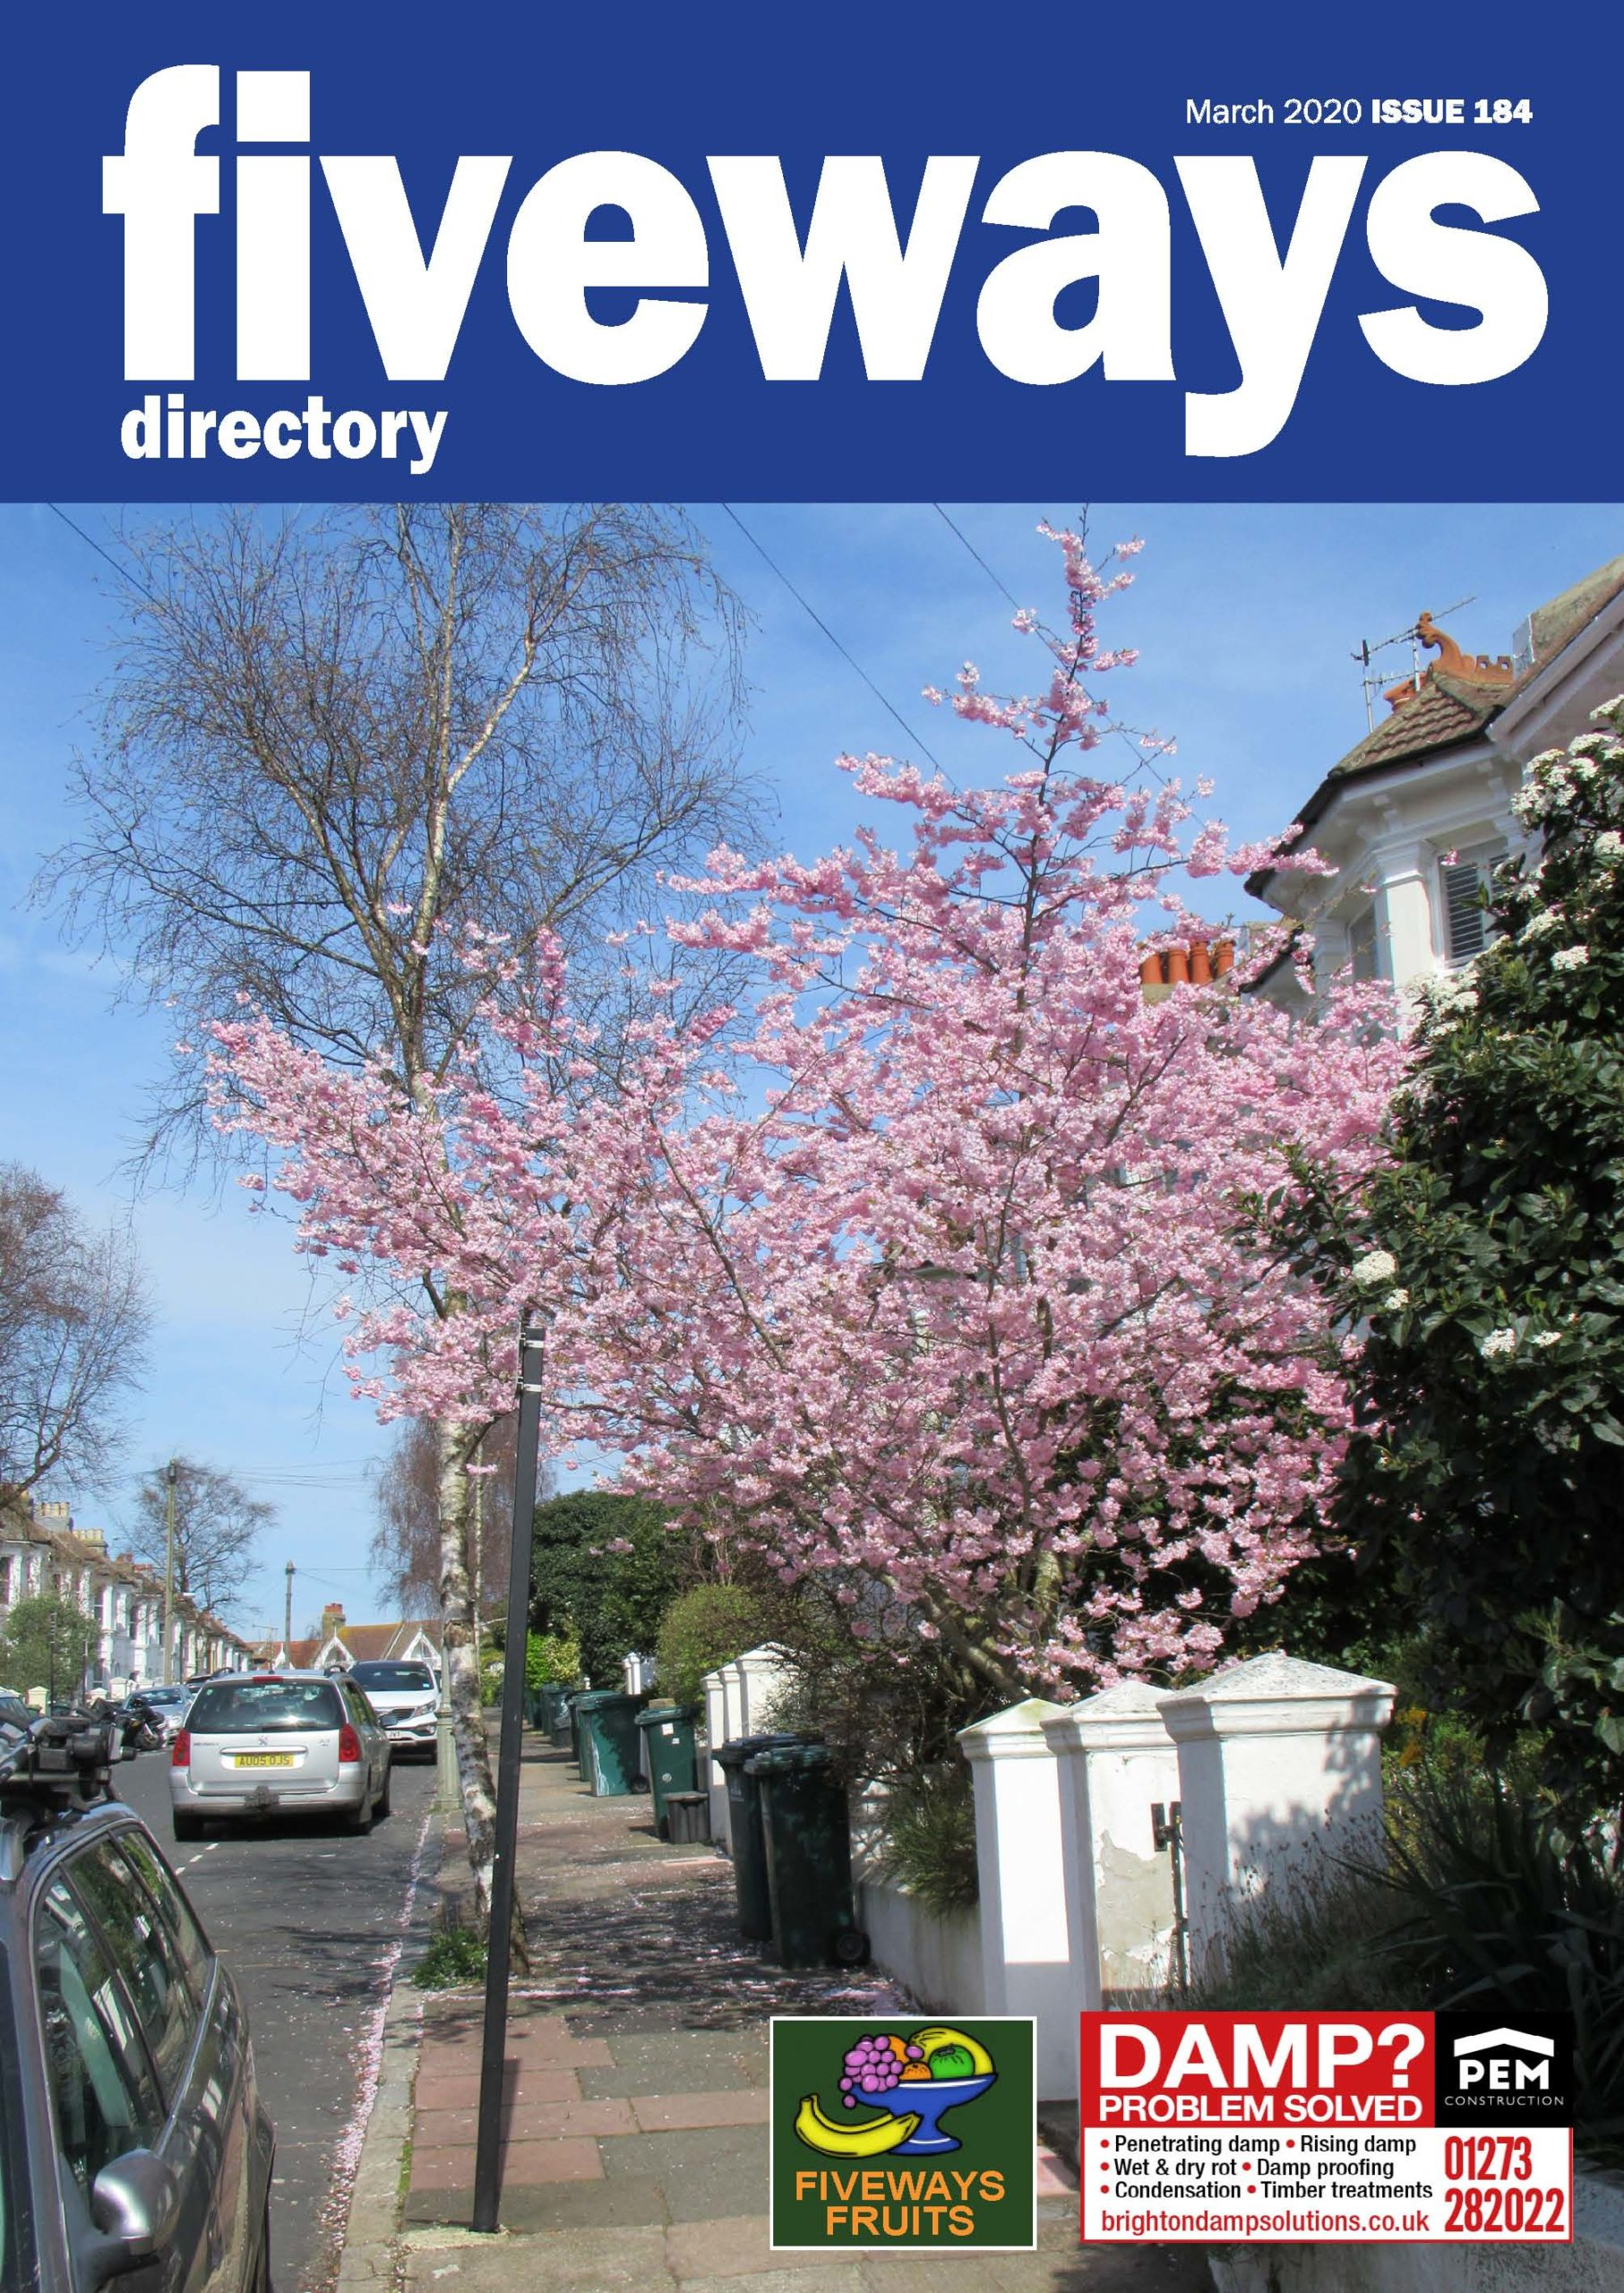 Fiveways Directory